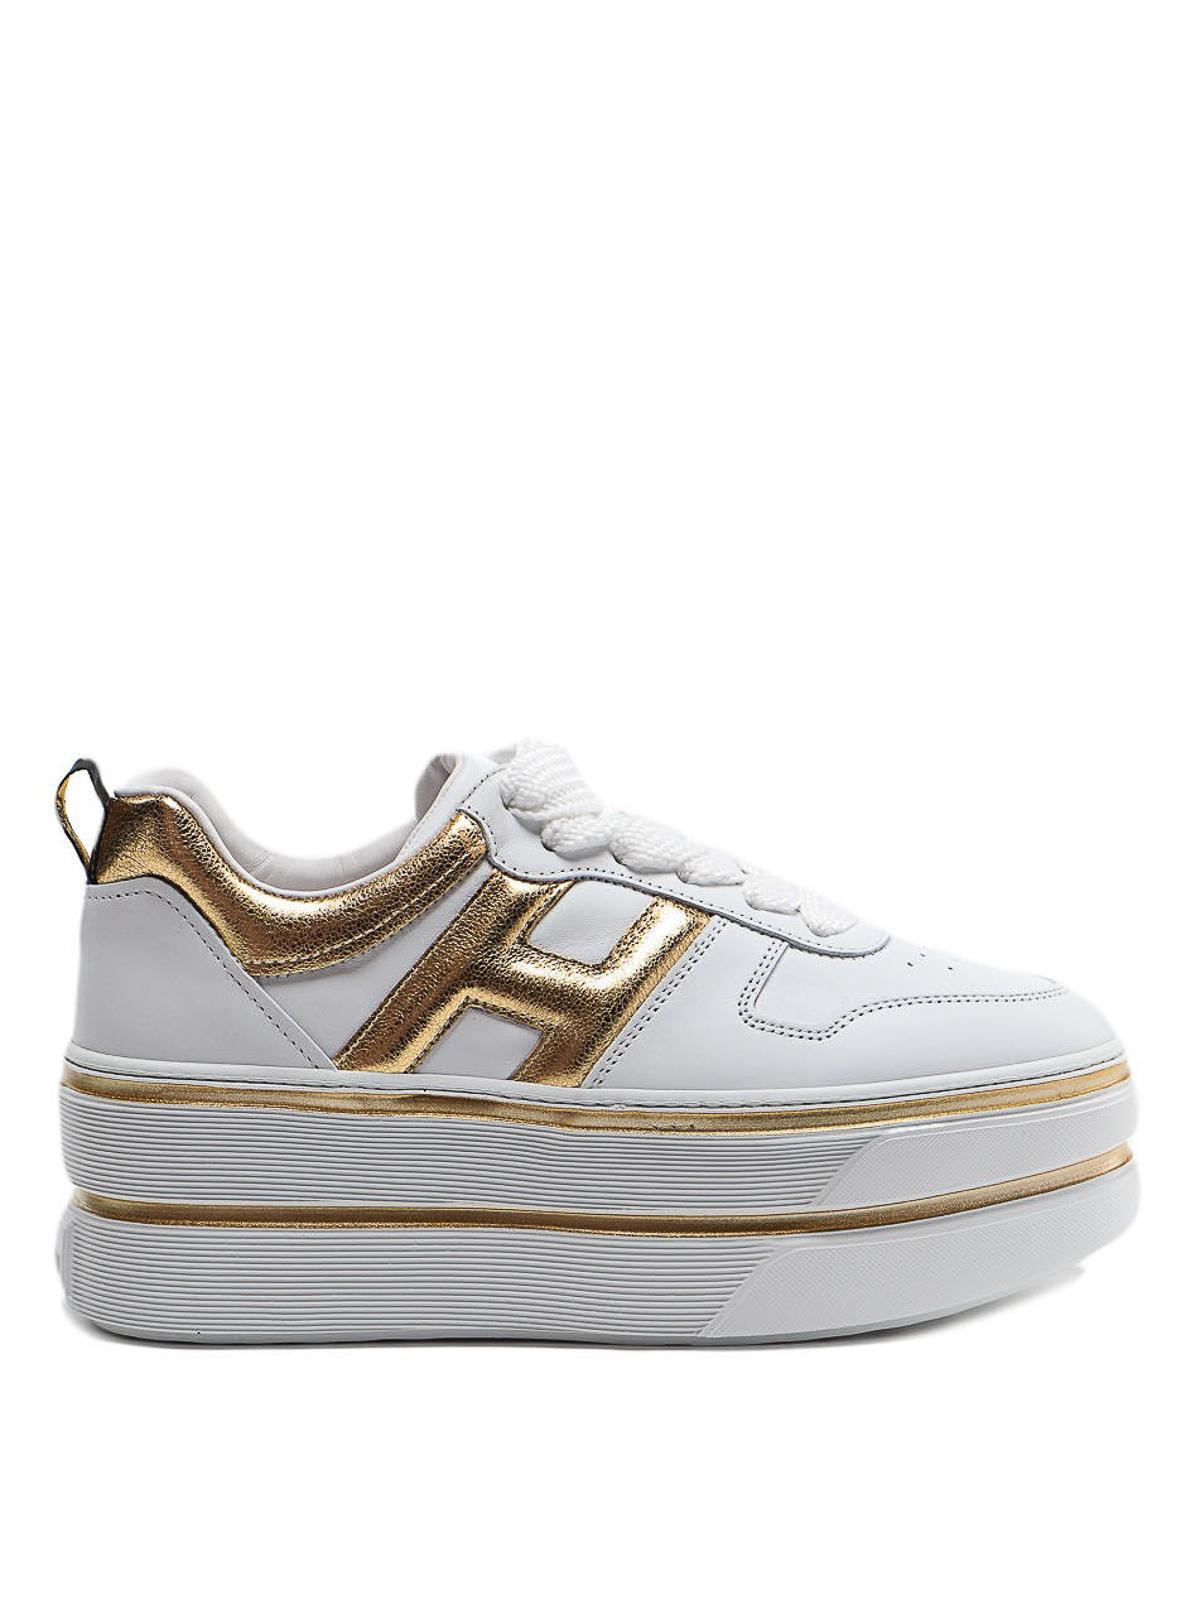 Sneakers Hogan - Sneaker H449 maxi bianca e oro - HXW4490BS01ISR0746